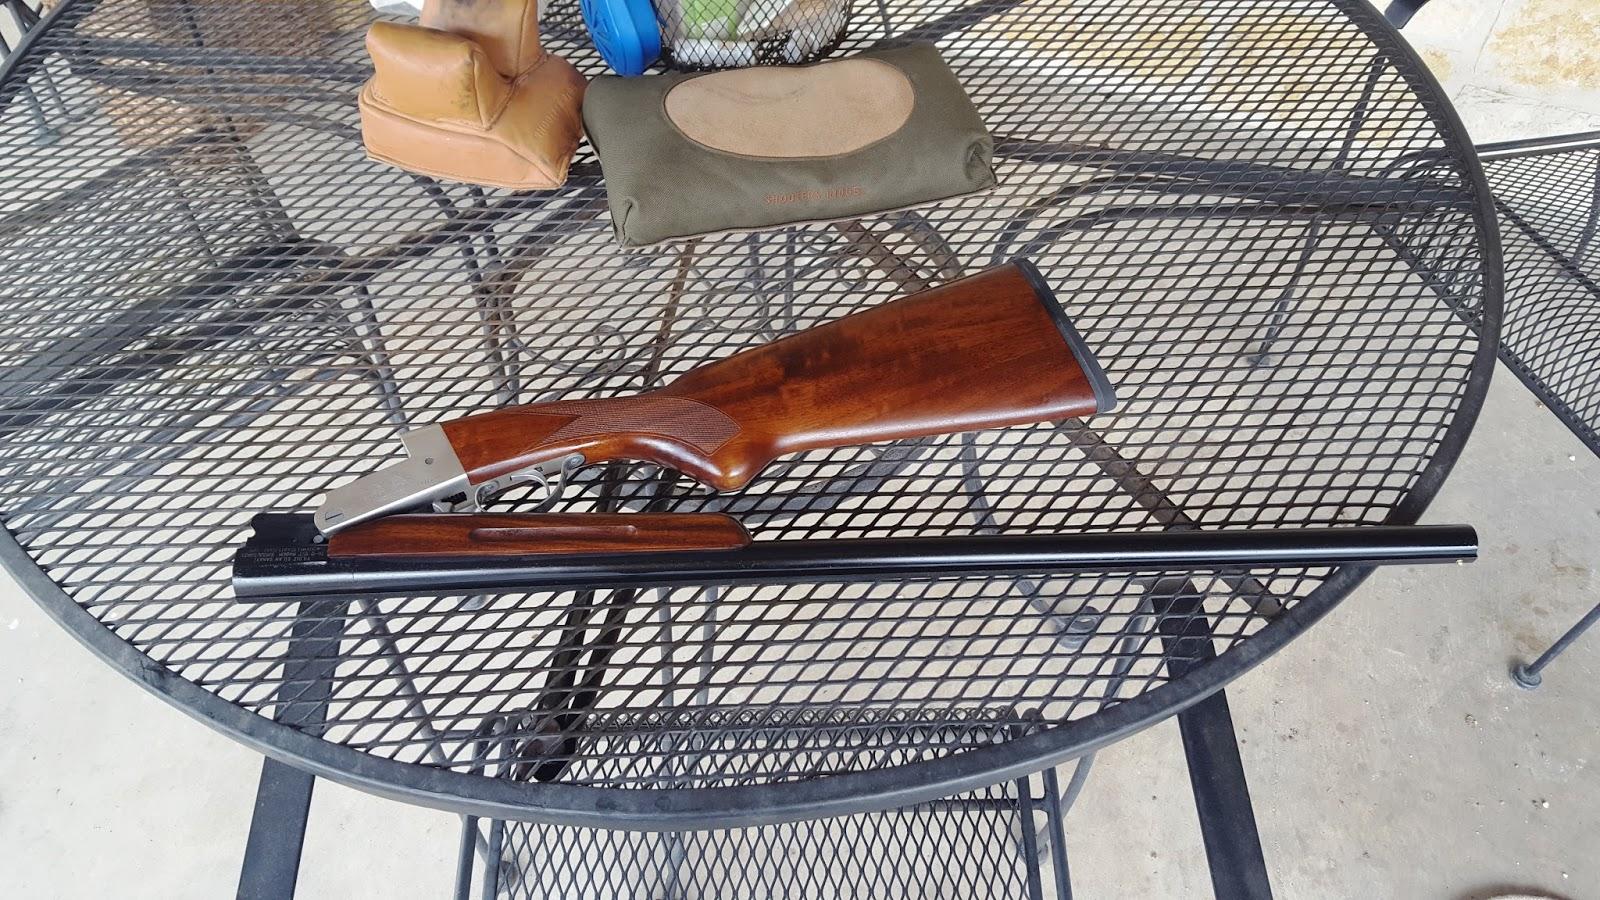 Wild Ed's Texas Outdoors: The Yildiz 12 Gauge Folding Shotgun